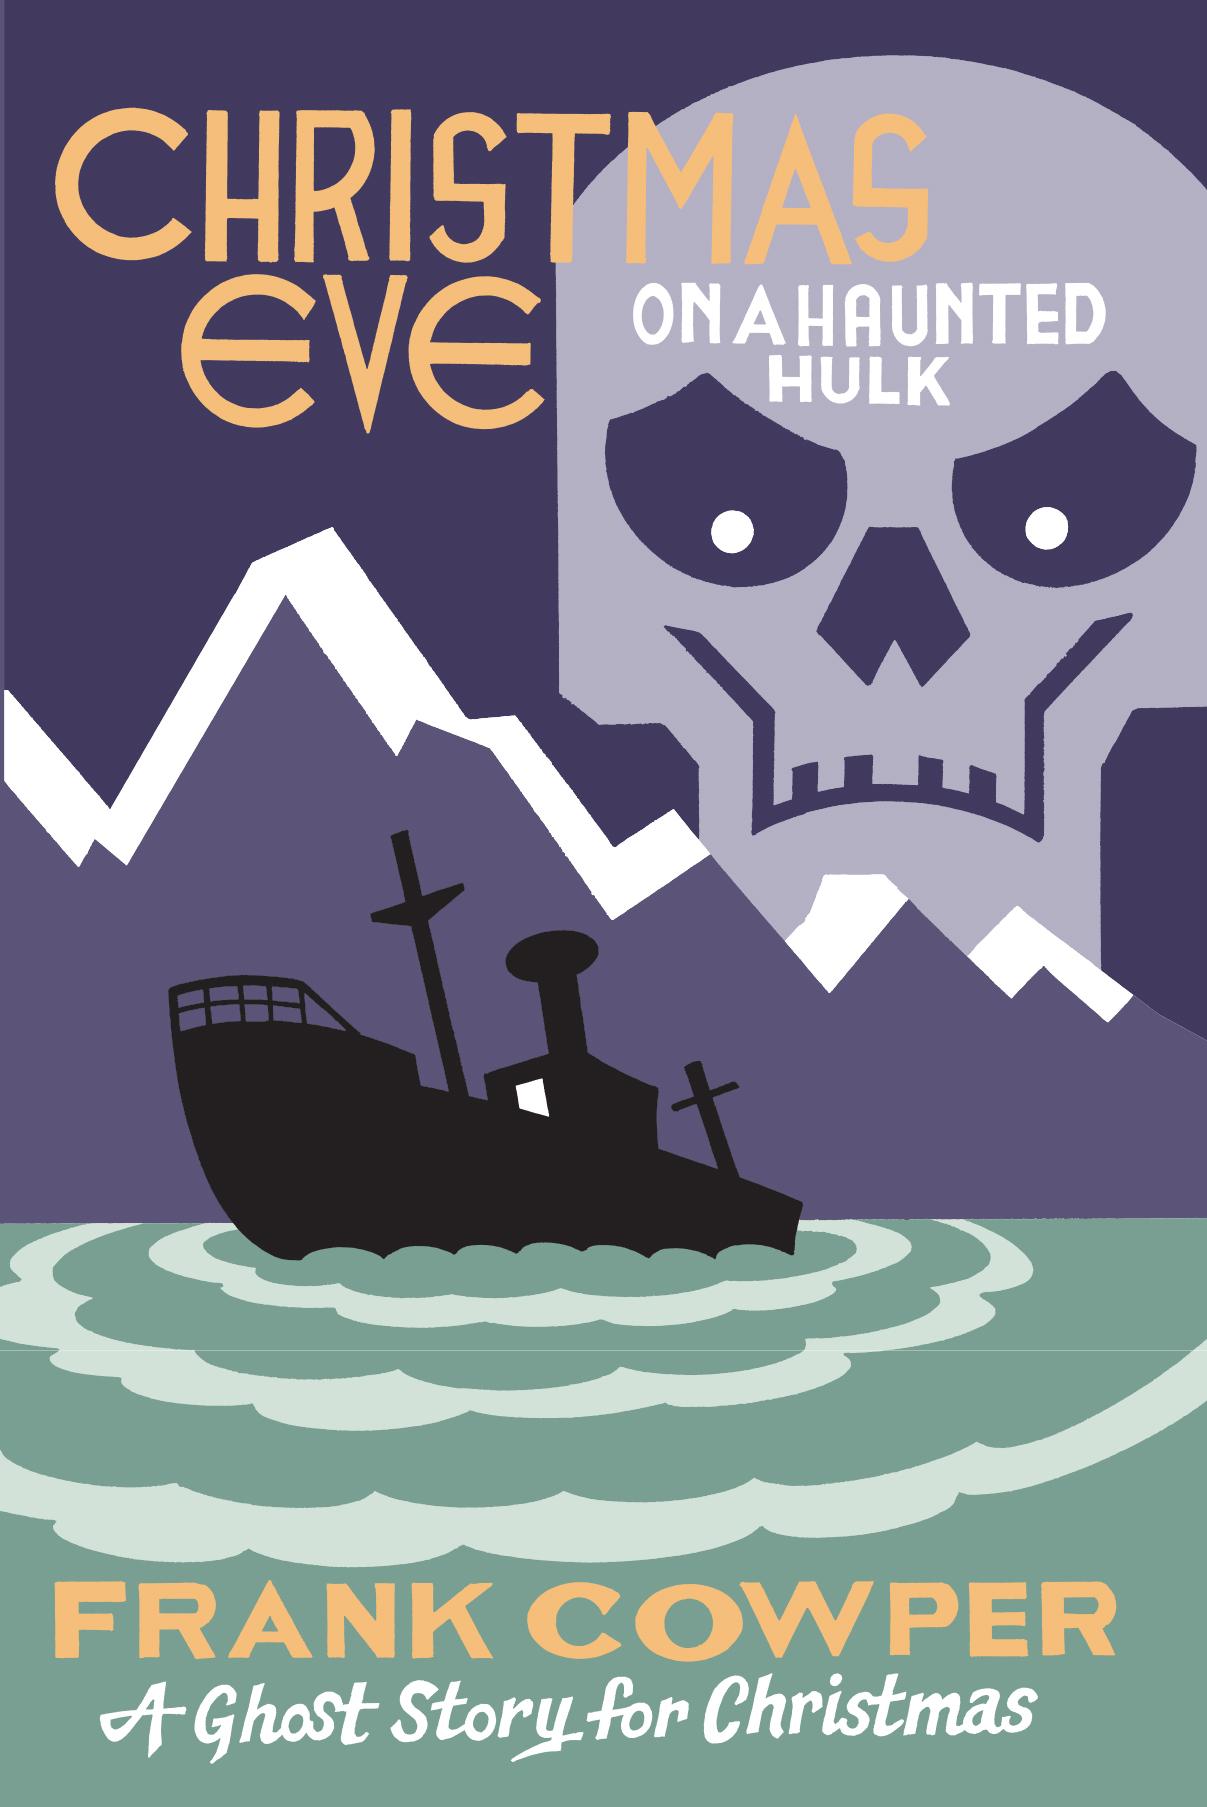 HauntedHulk-Cover4a.indd